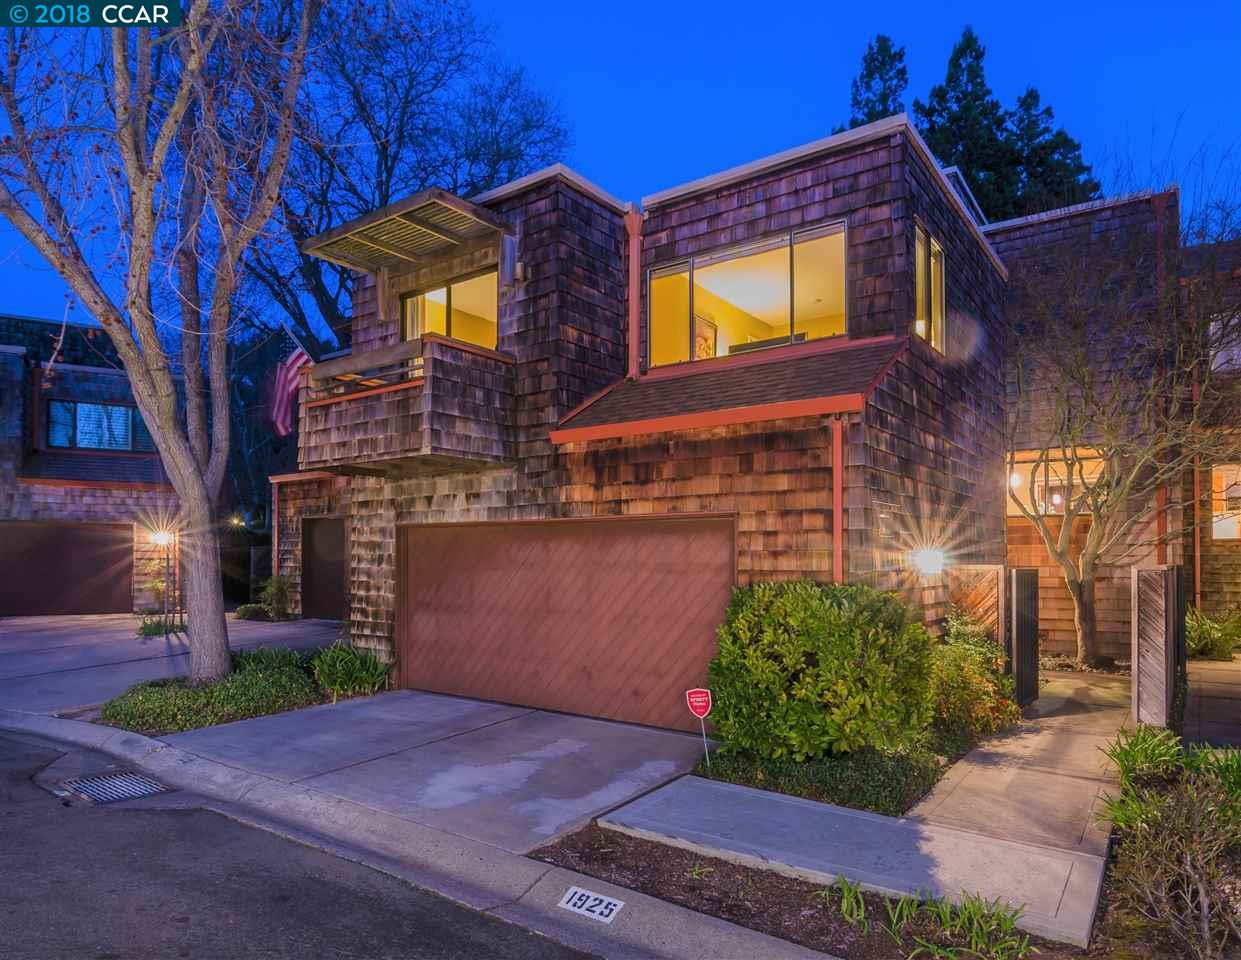 Townhouse for Sale at 1925 Highridge Court 1925 Highridge Court Walnut Creek, California 94597 United States